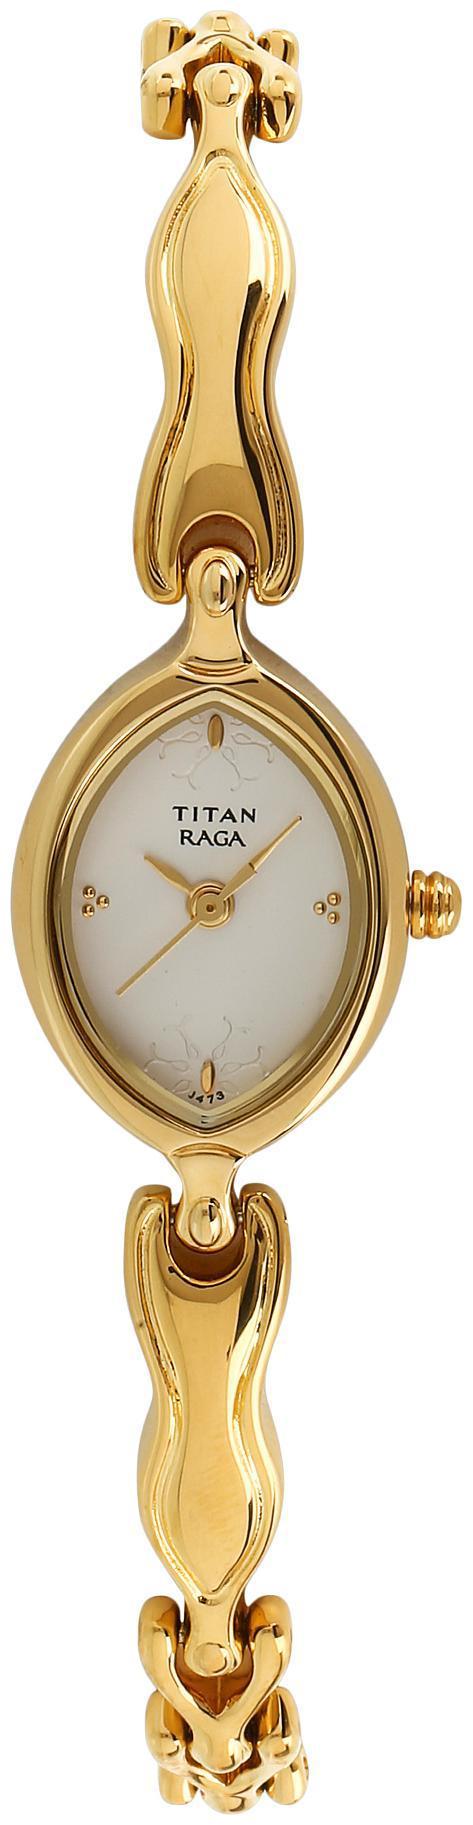 Titan Analog Watch for women by Titan Company